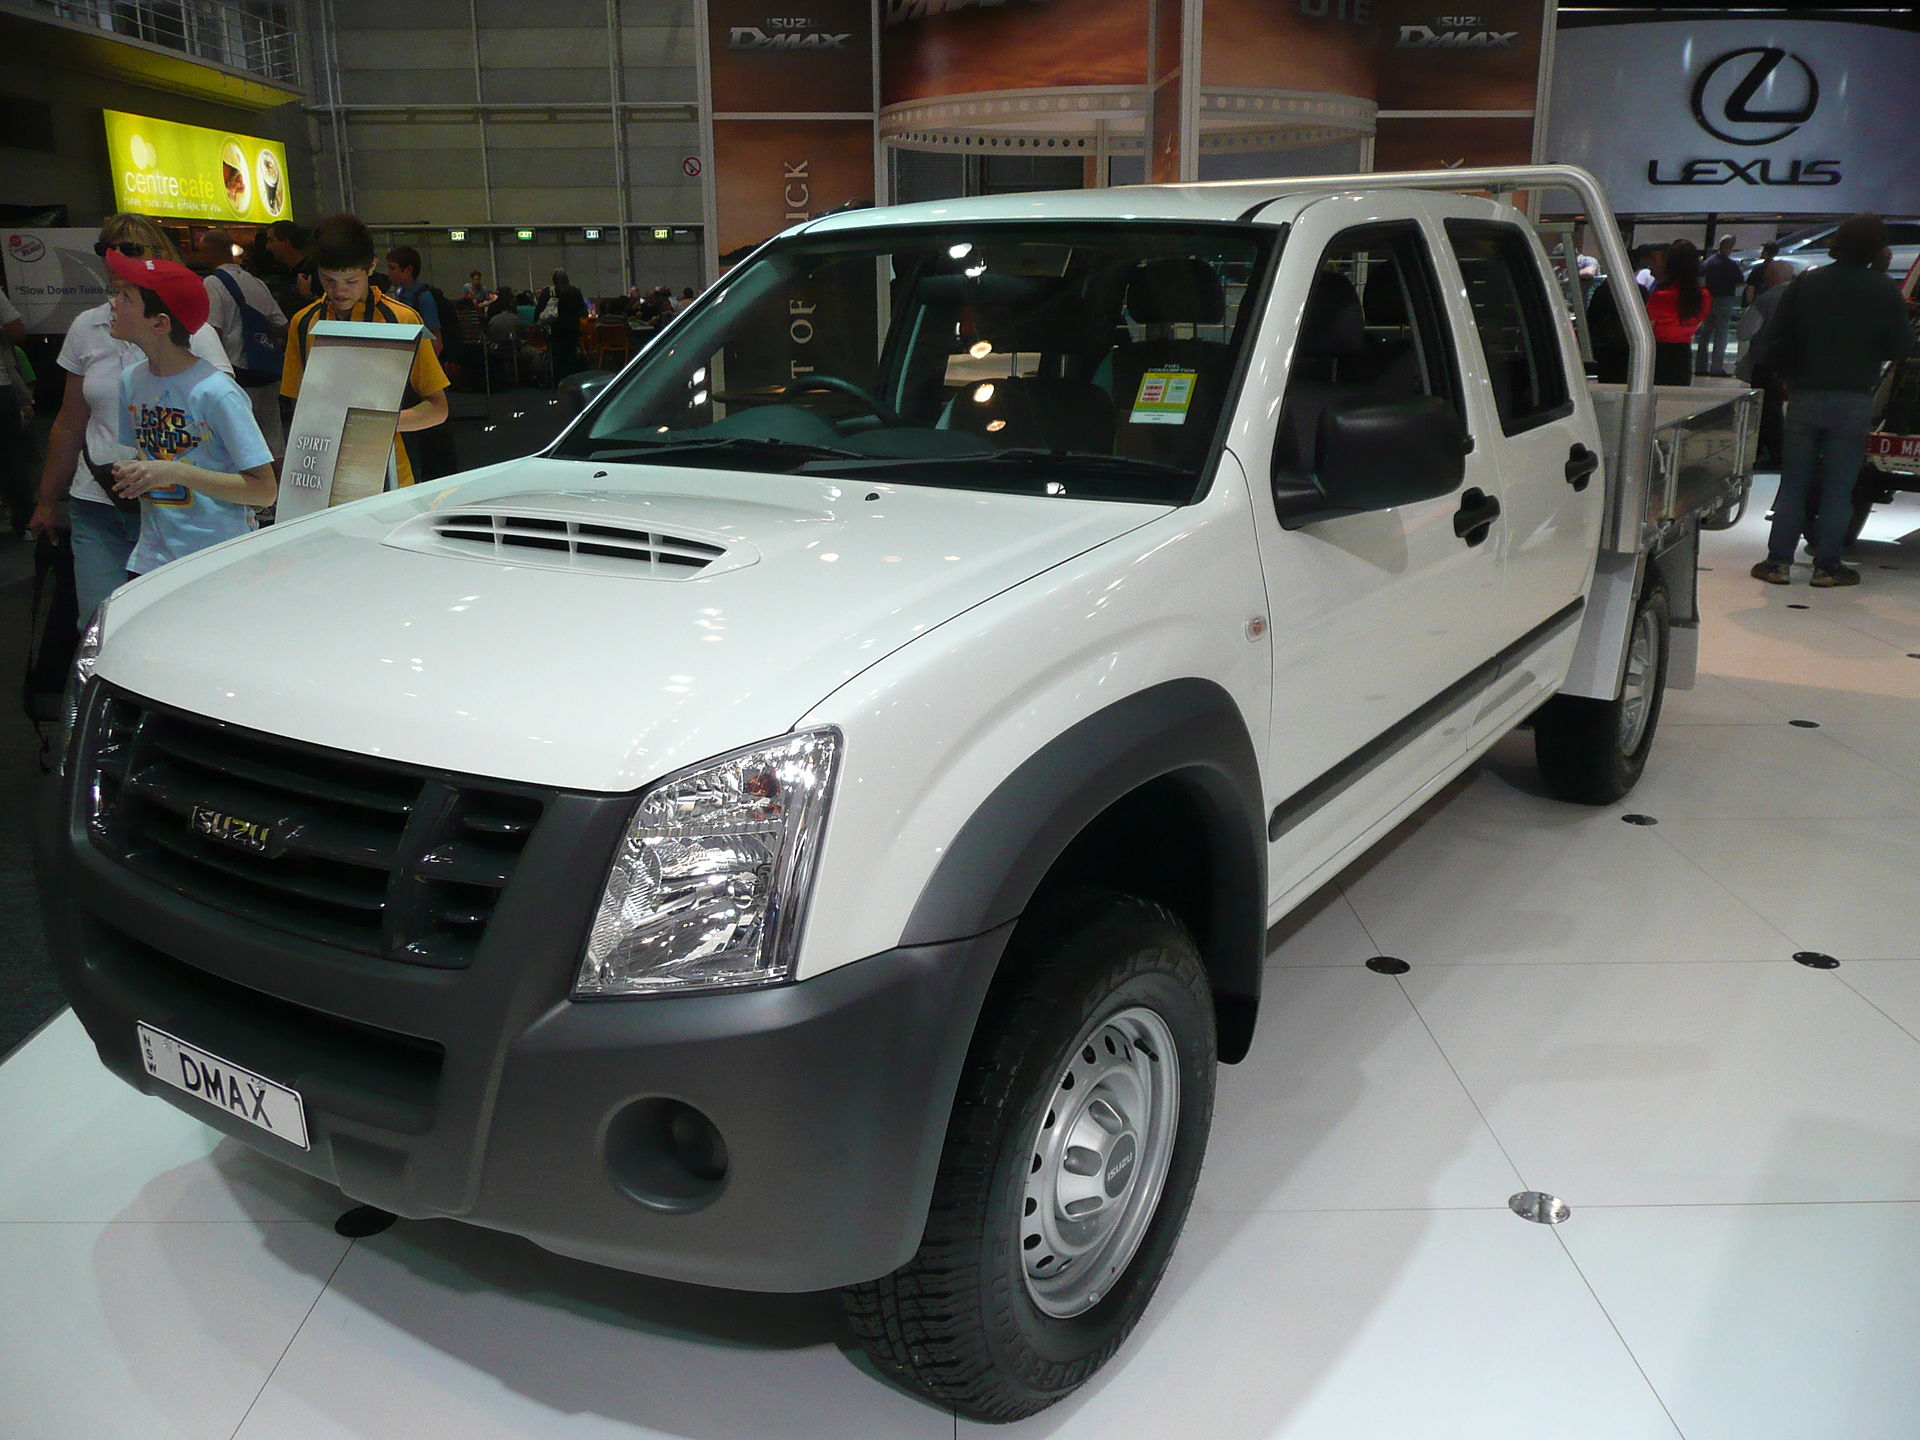 Isuzu Trucks South Africa - Wikipedia